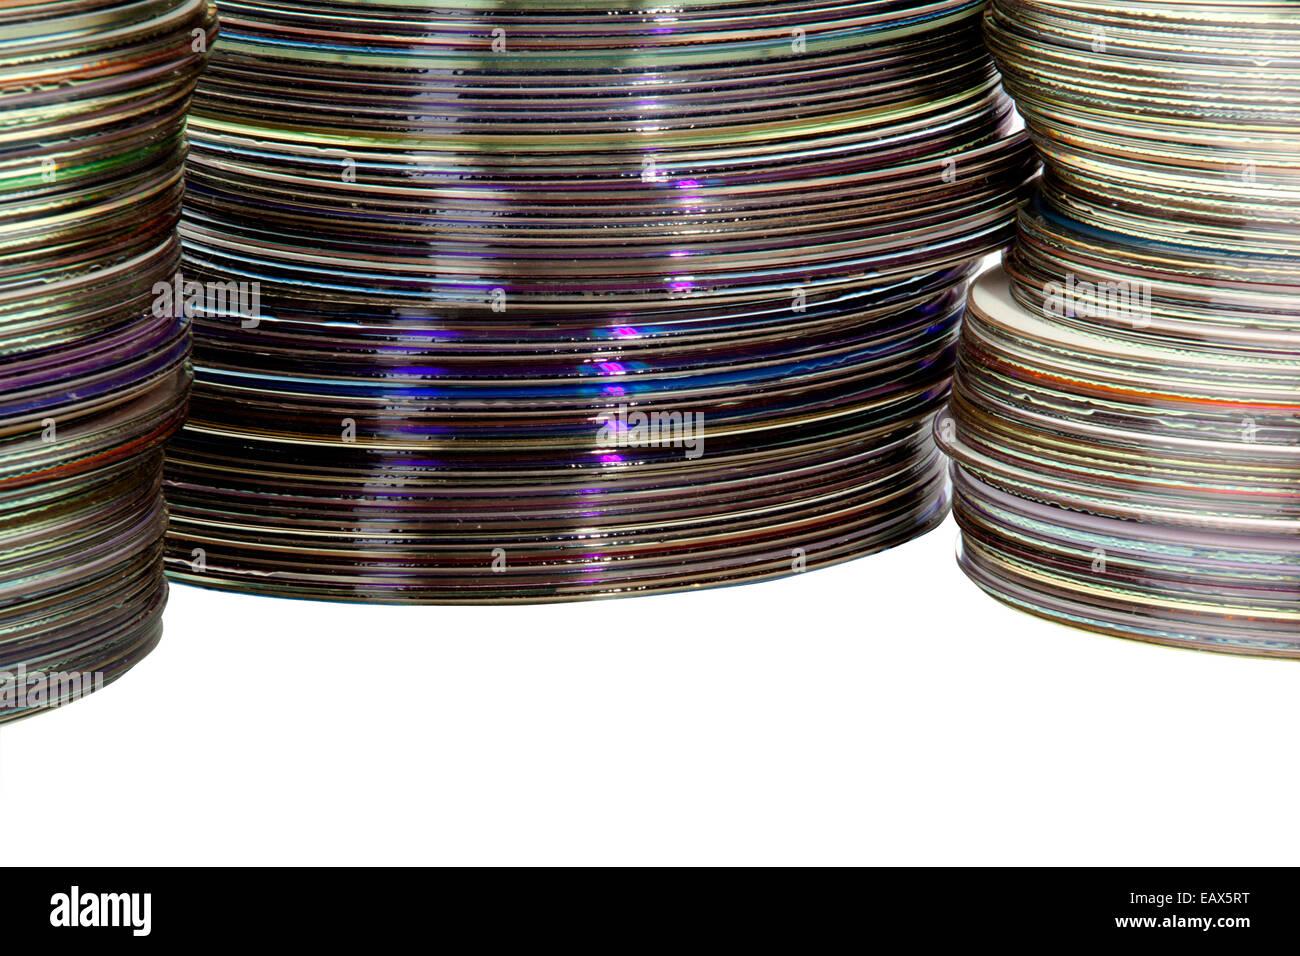 closeup three piles of colorful compact discs Stock Photo